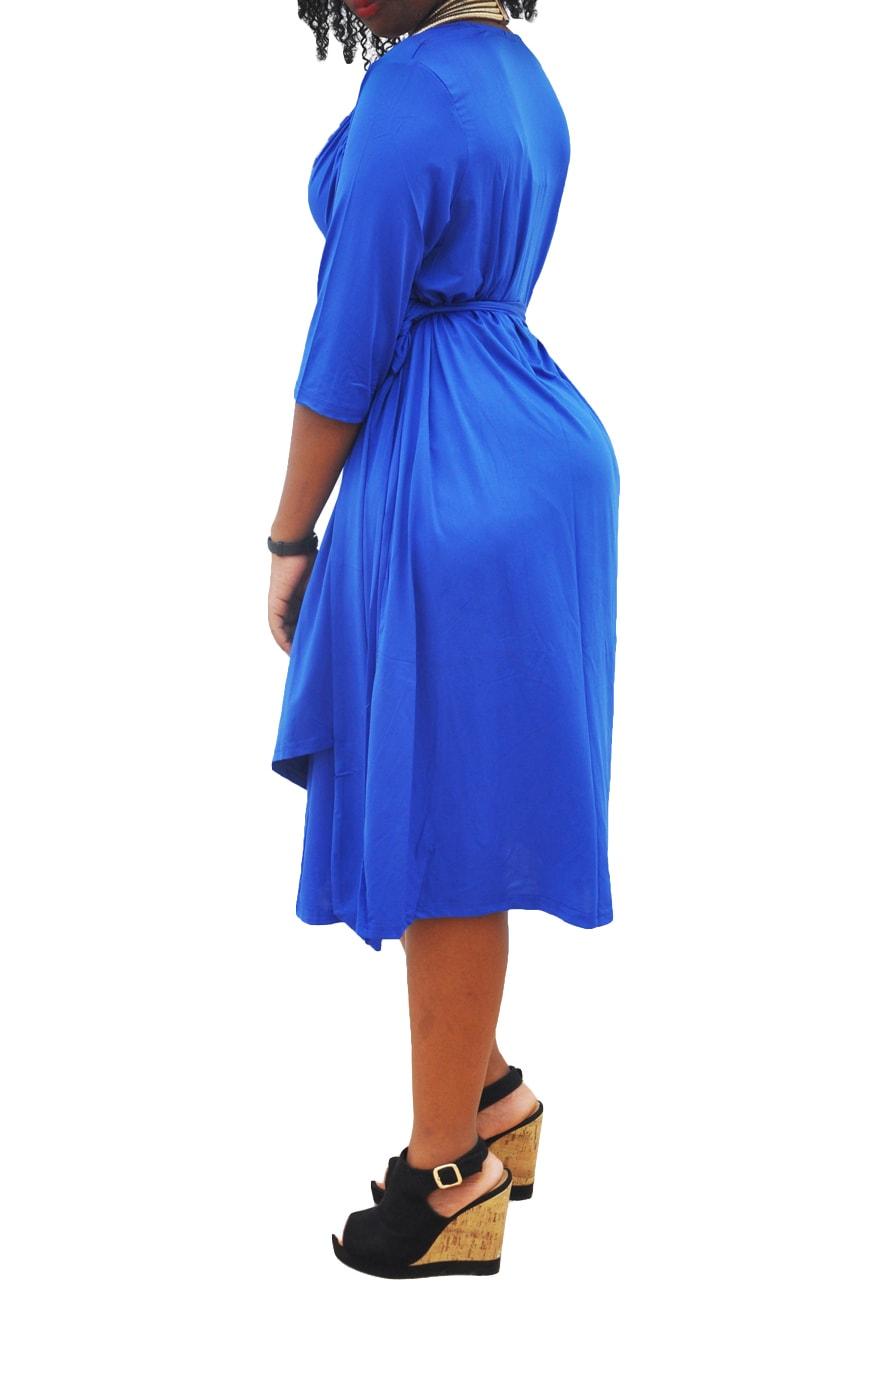 M0281 blue4 Short Sleeve Dresses maureens.com boutique